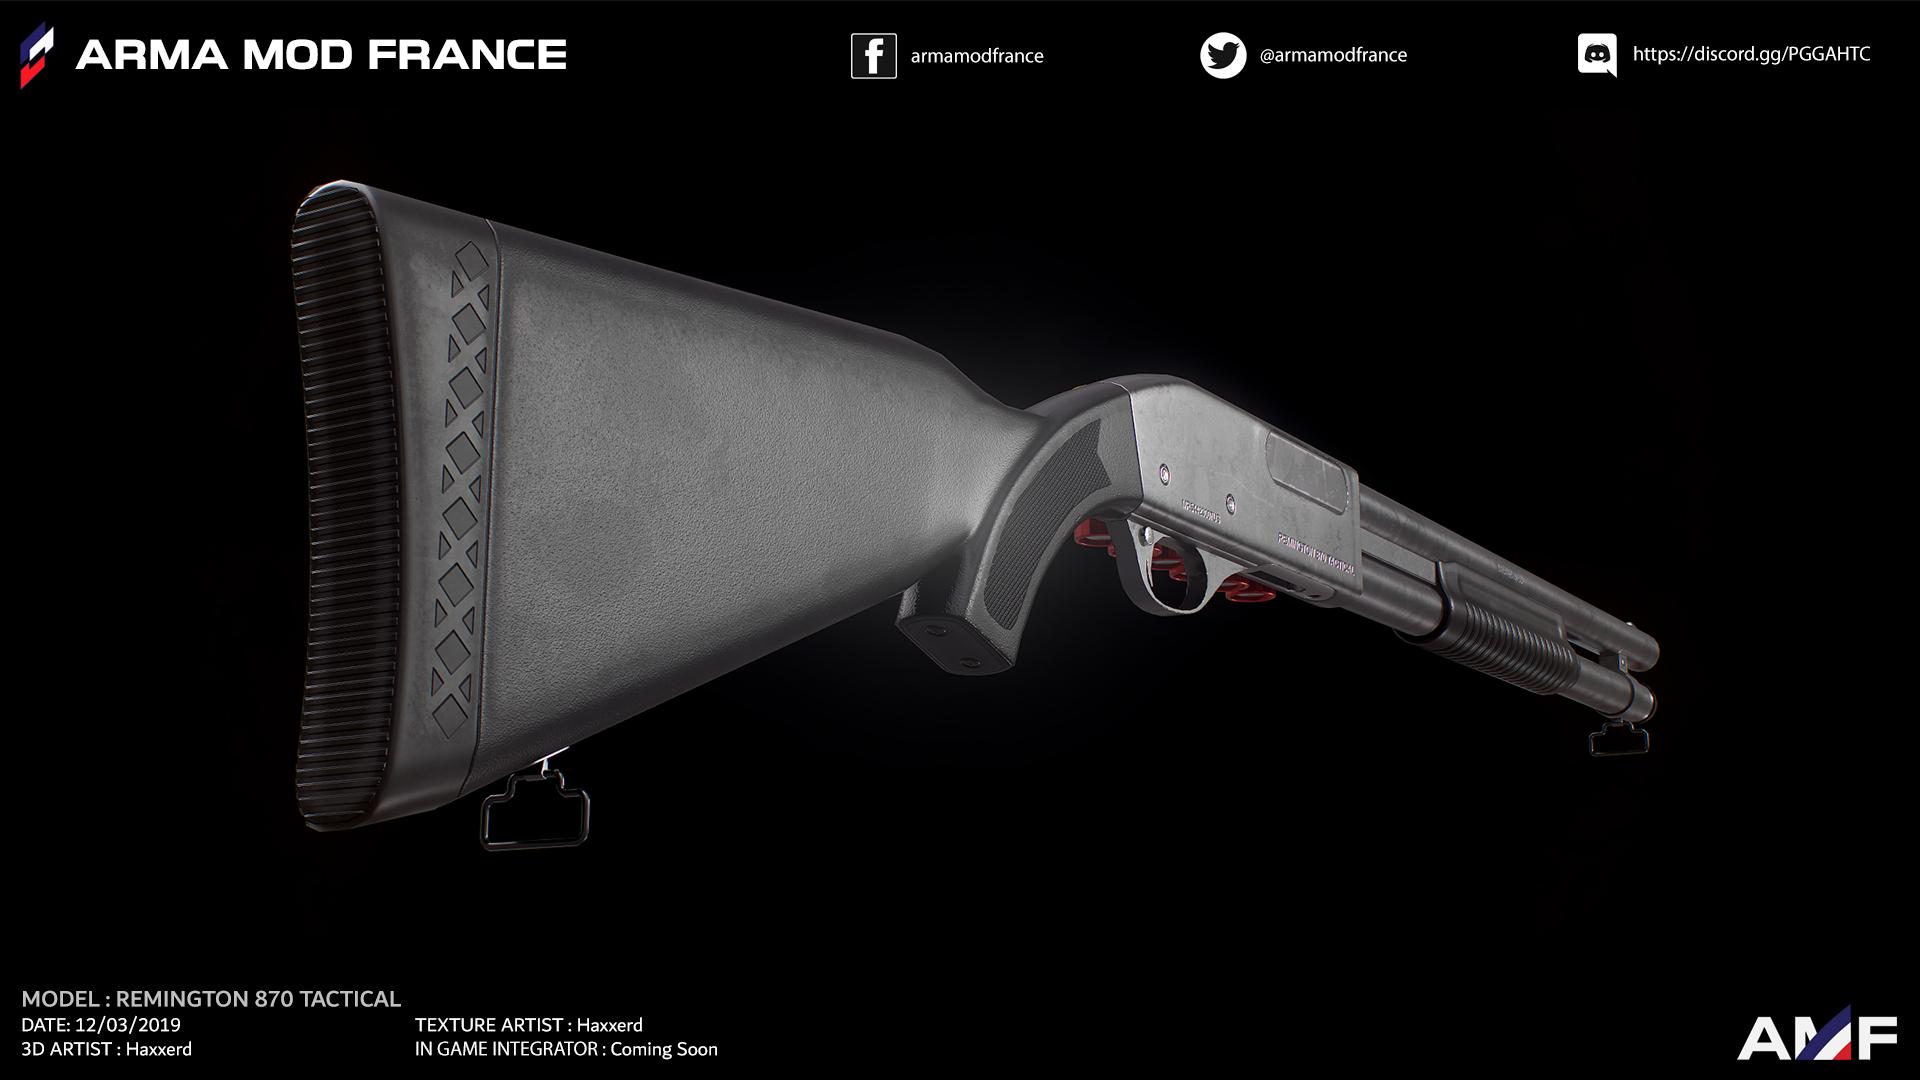 remington870Tactical02.png